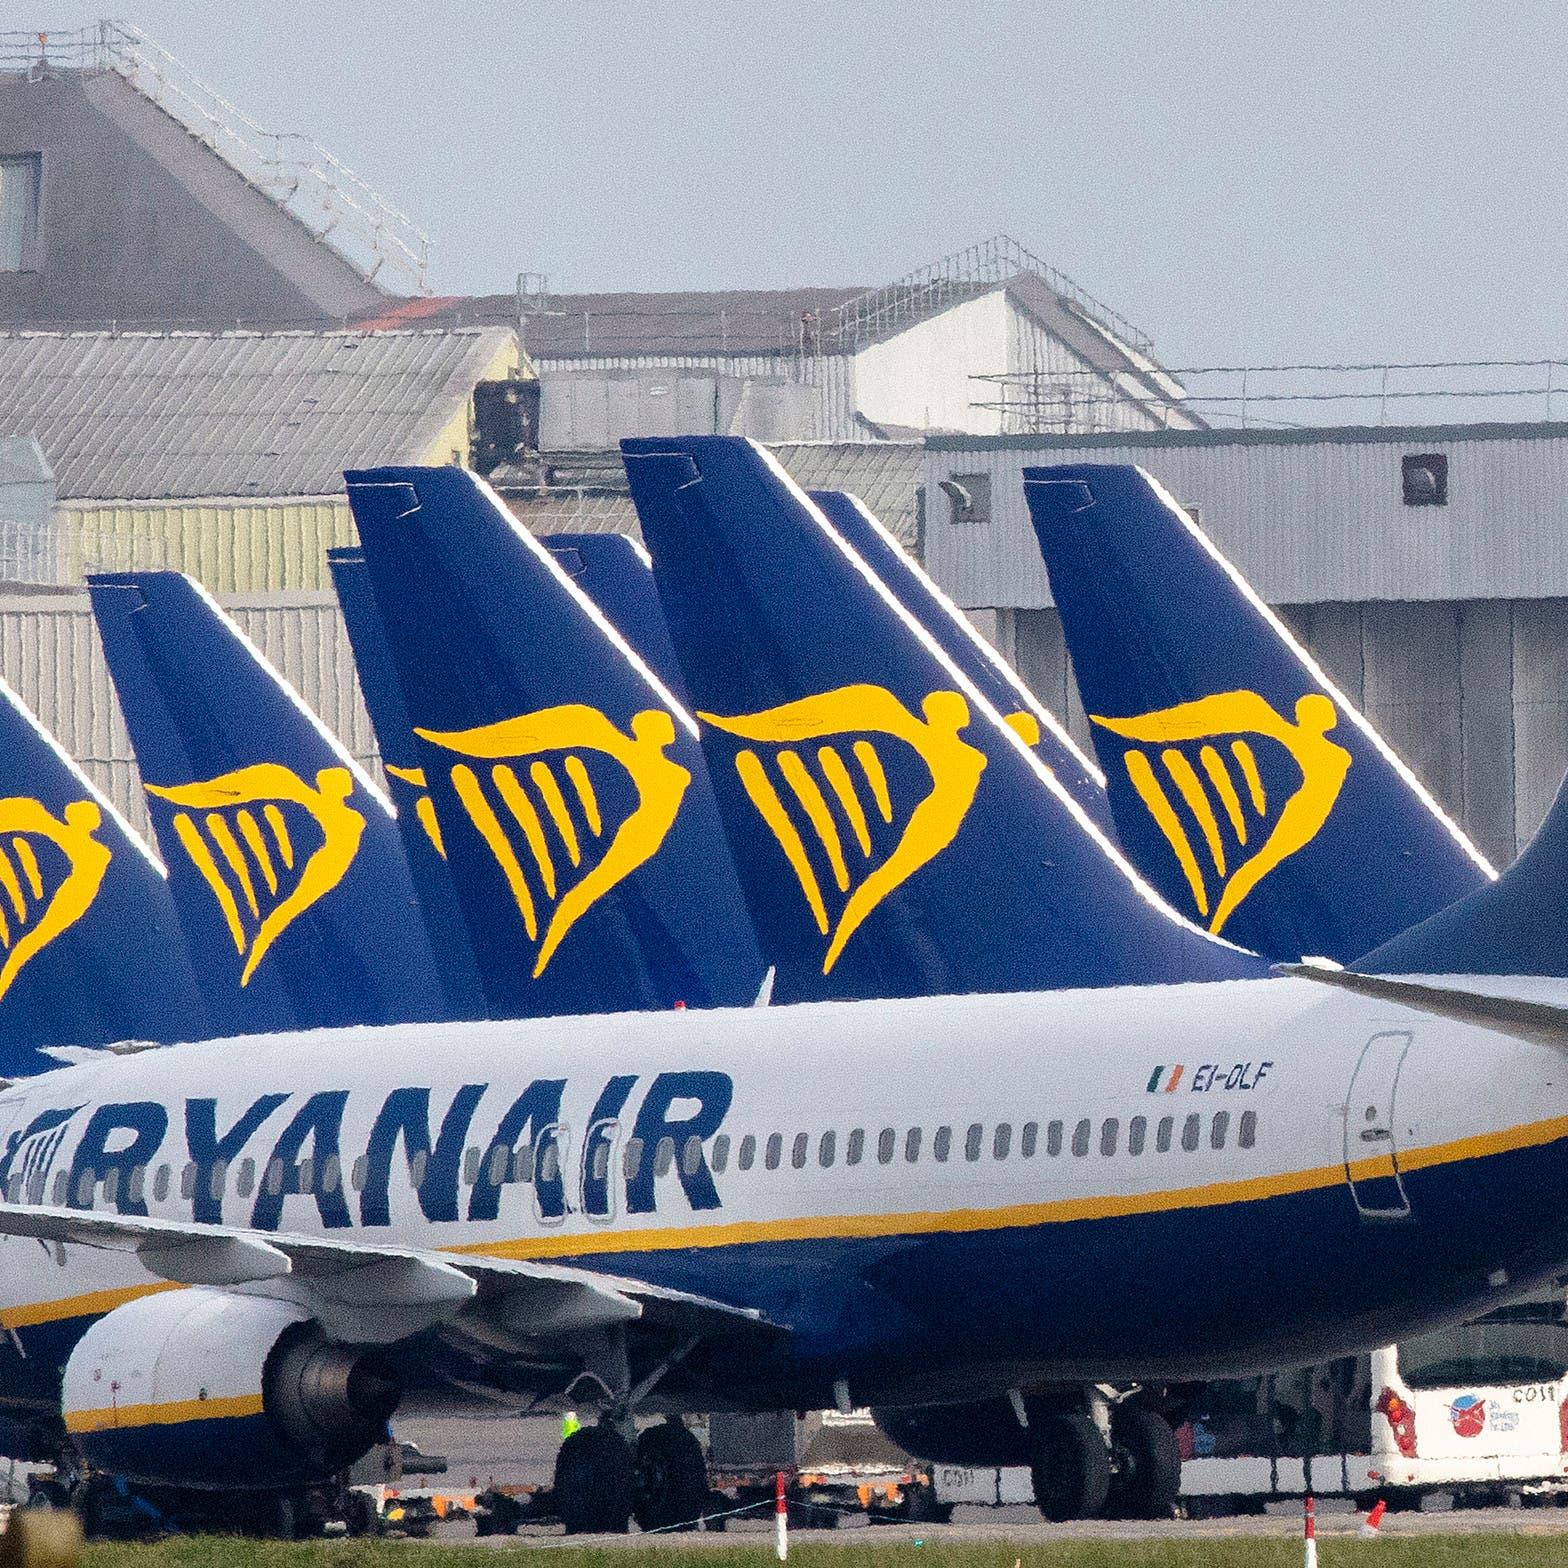 Ryanair تتوقع كبح الخسائر مع انتعاش السفر في أوروبا